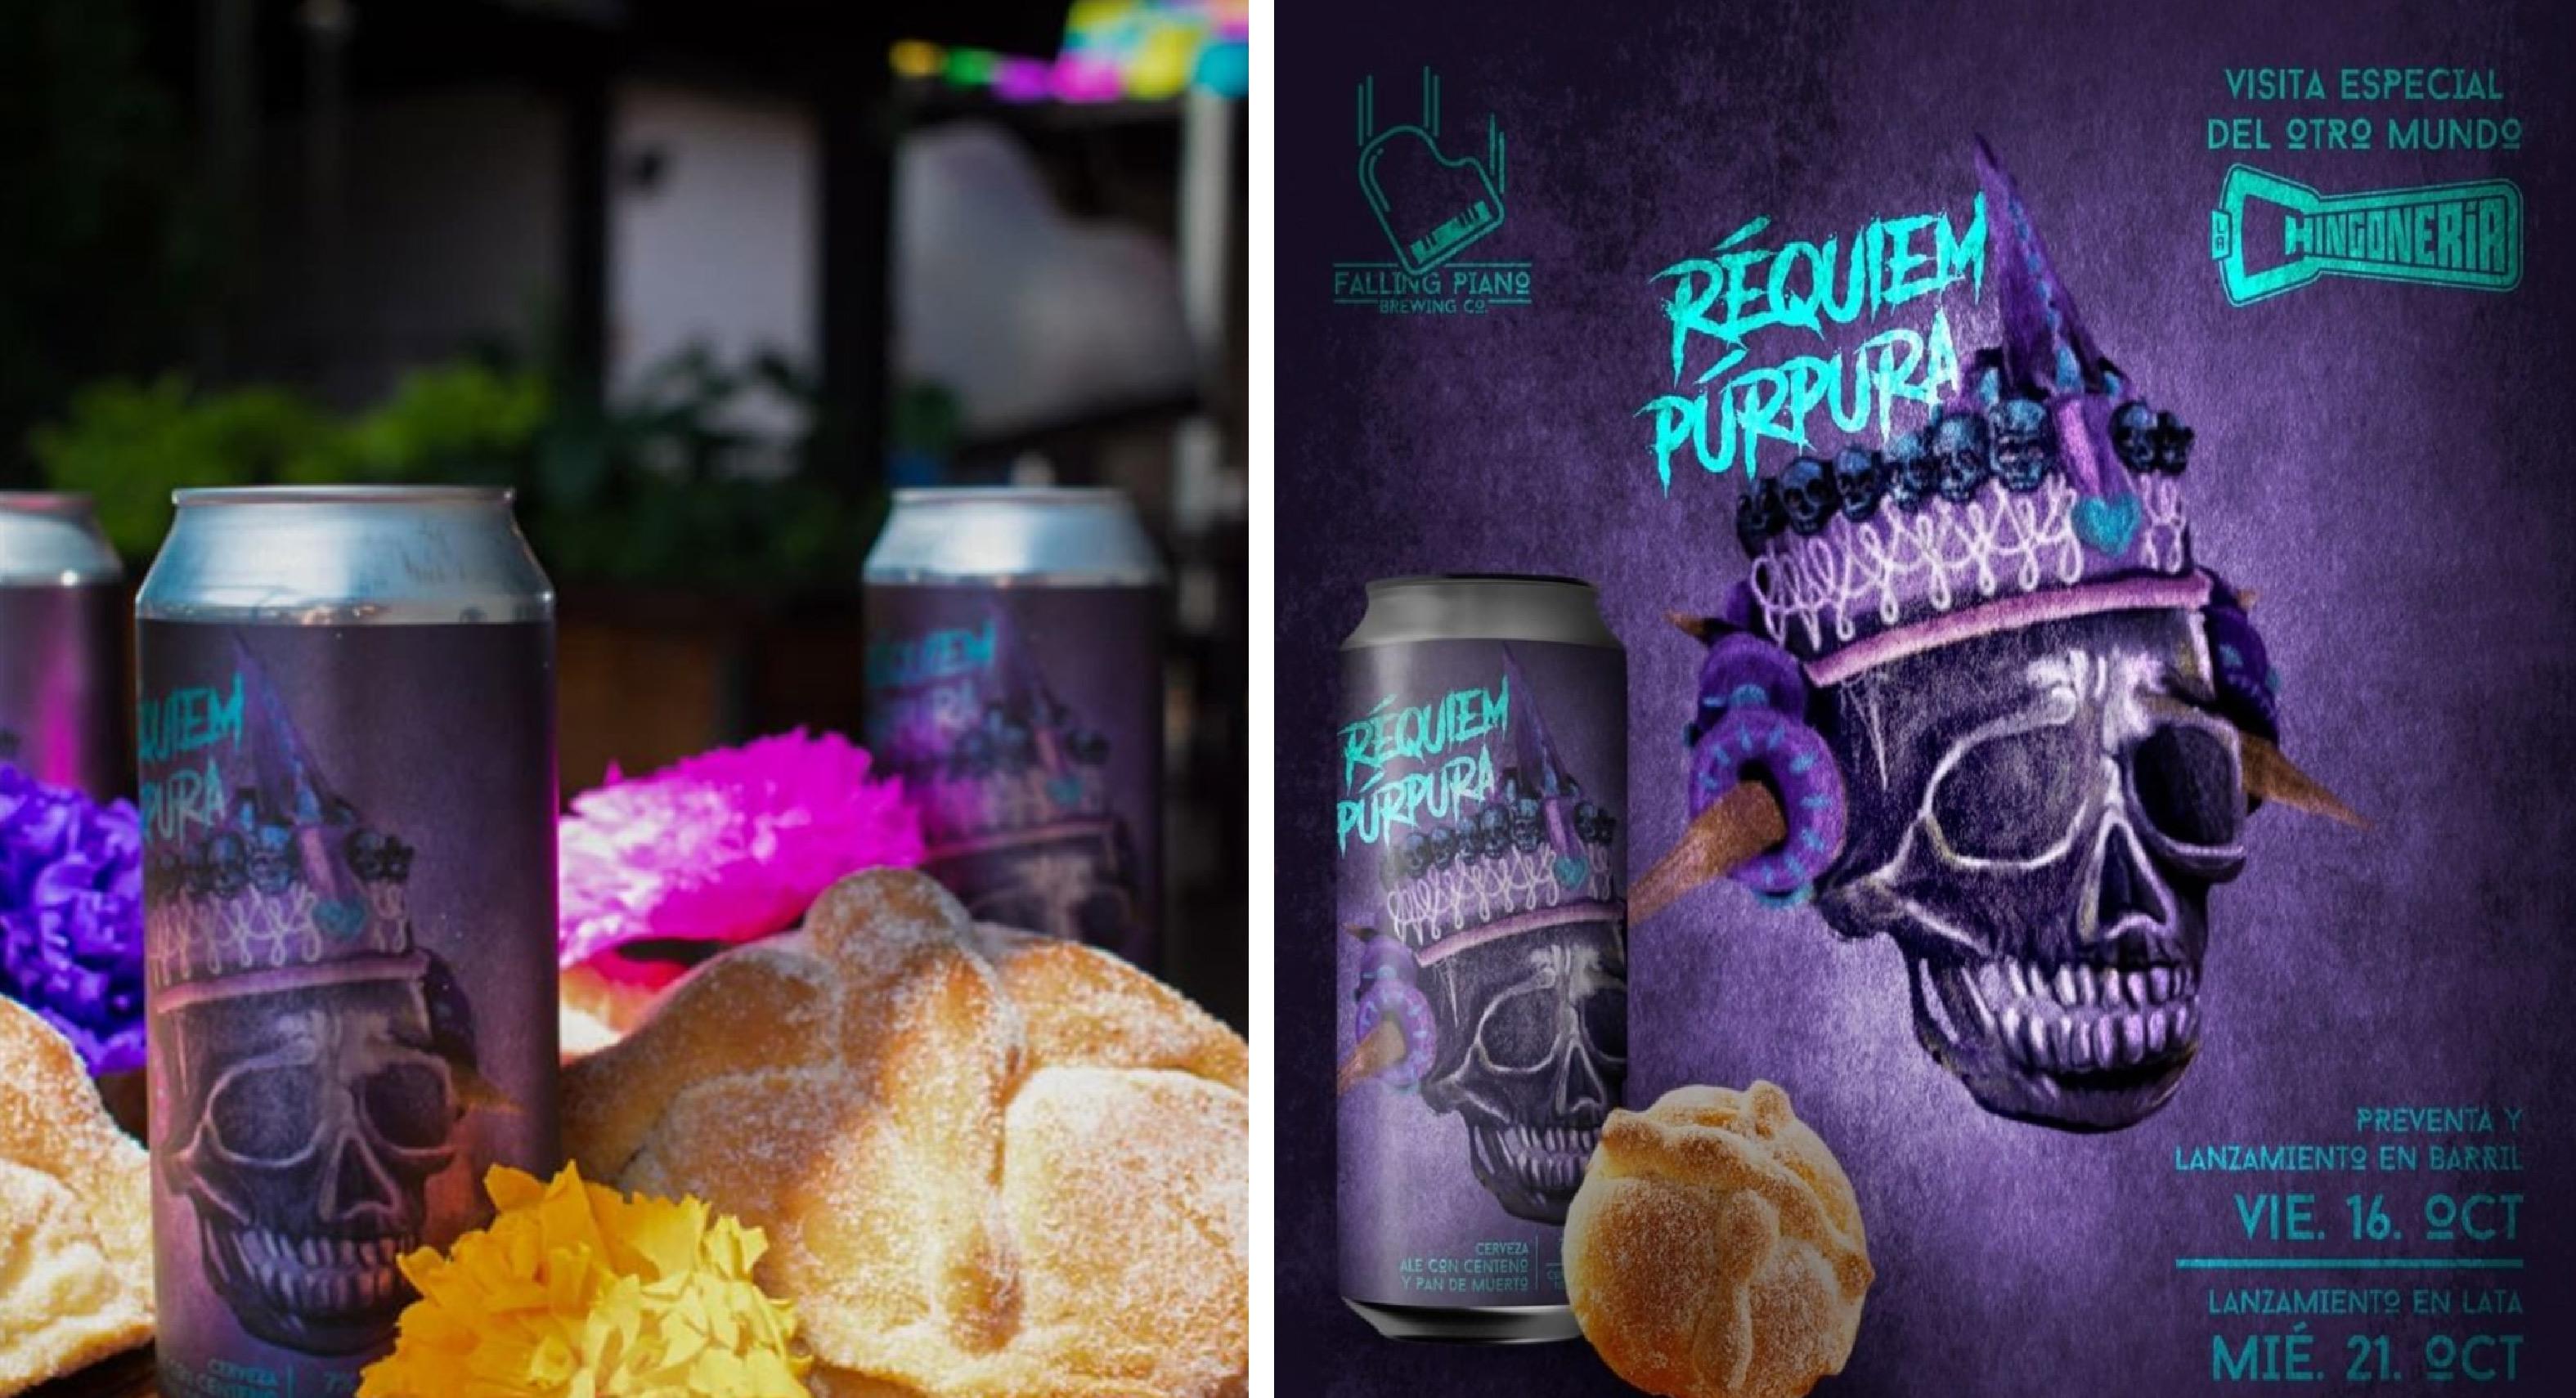 Cerveza hecha de pan de muerto llamada Réquiem Púrpura